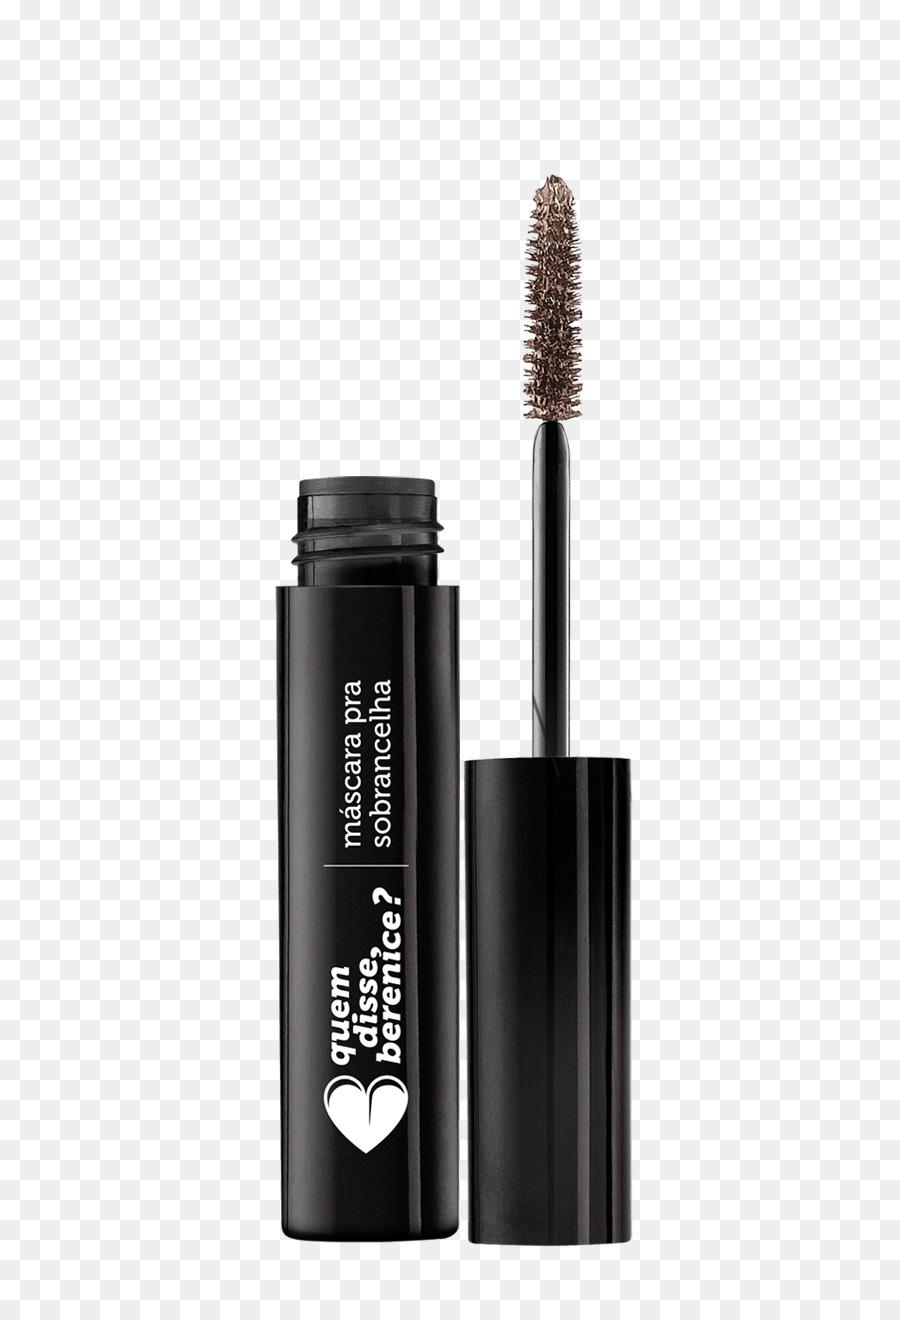 4ae274dbdbf Eyebrow Sephora NARS Cosmetics Maybelline - Notifications png ...